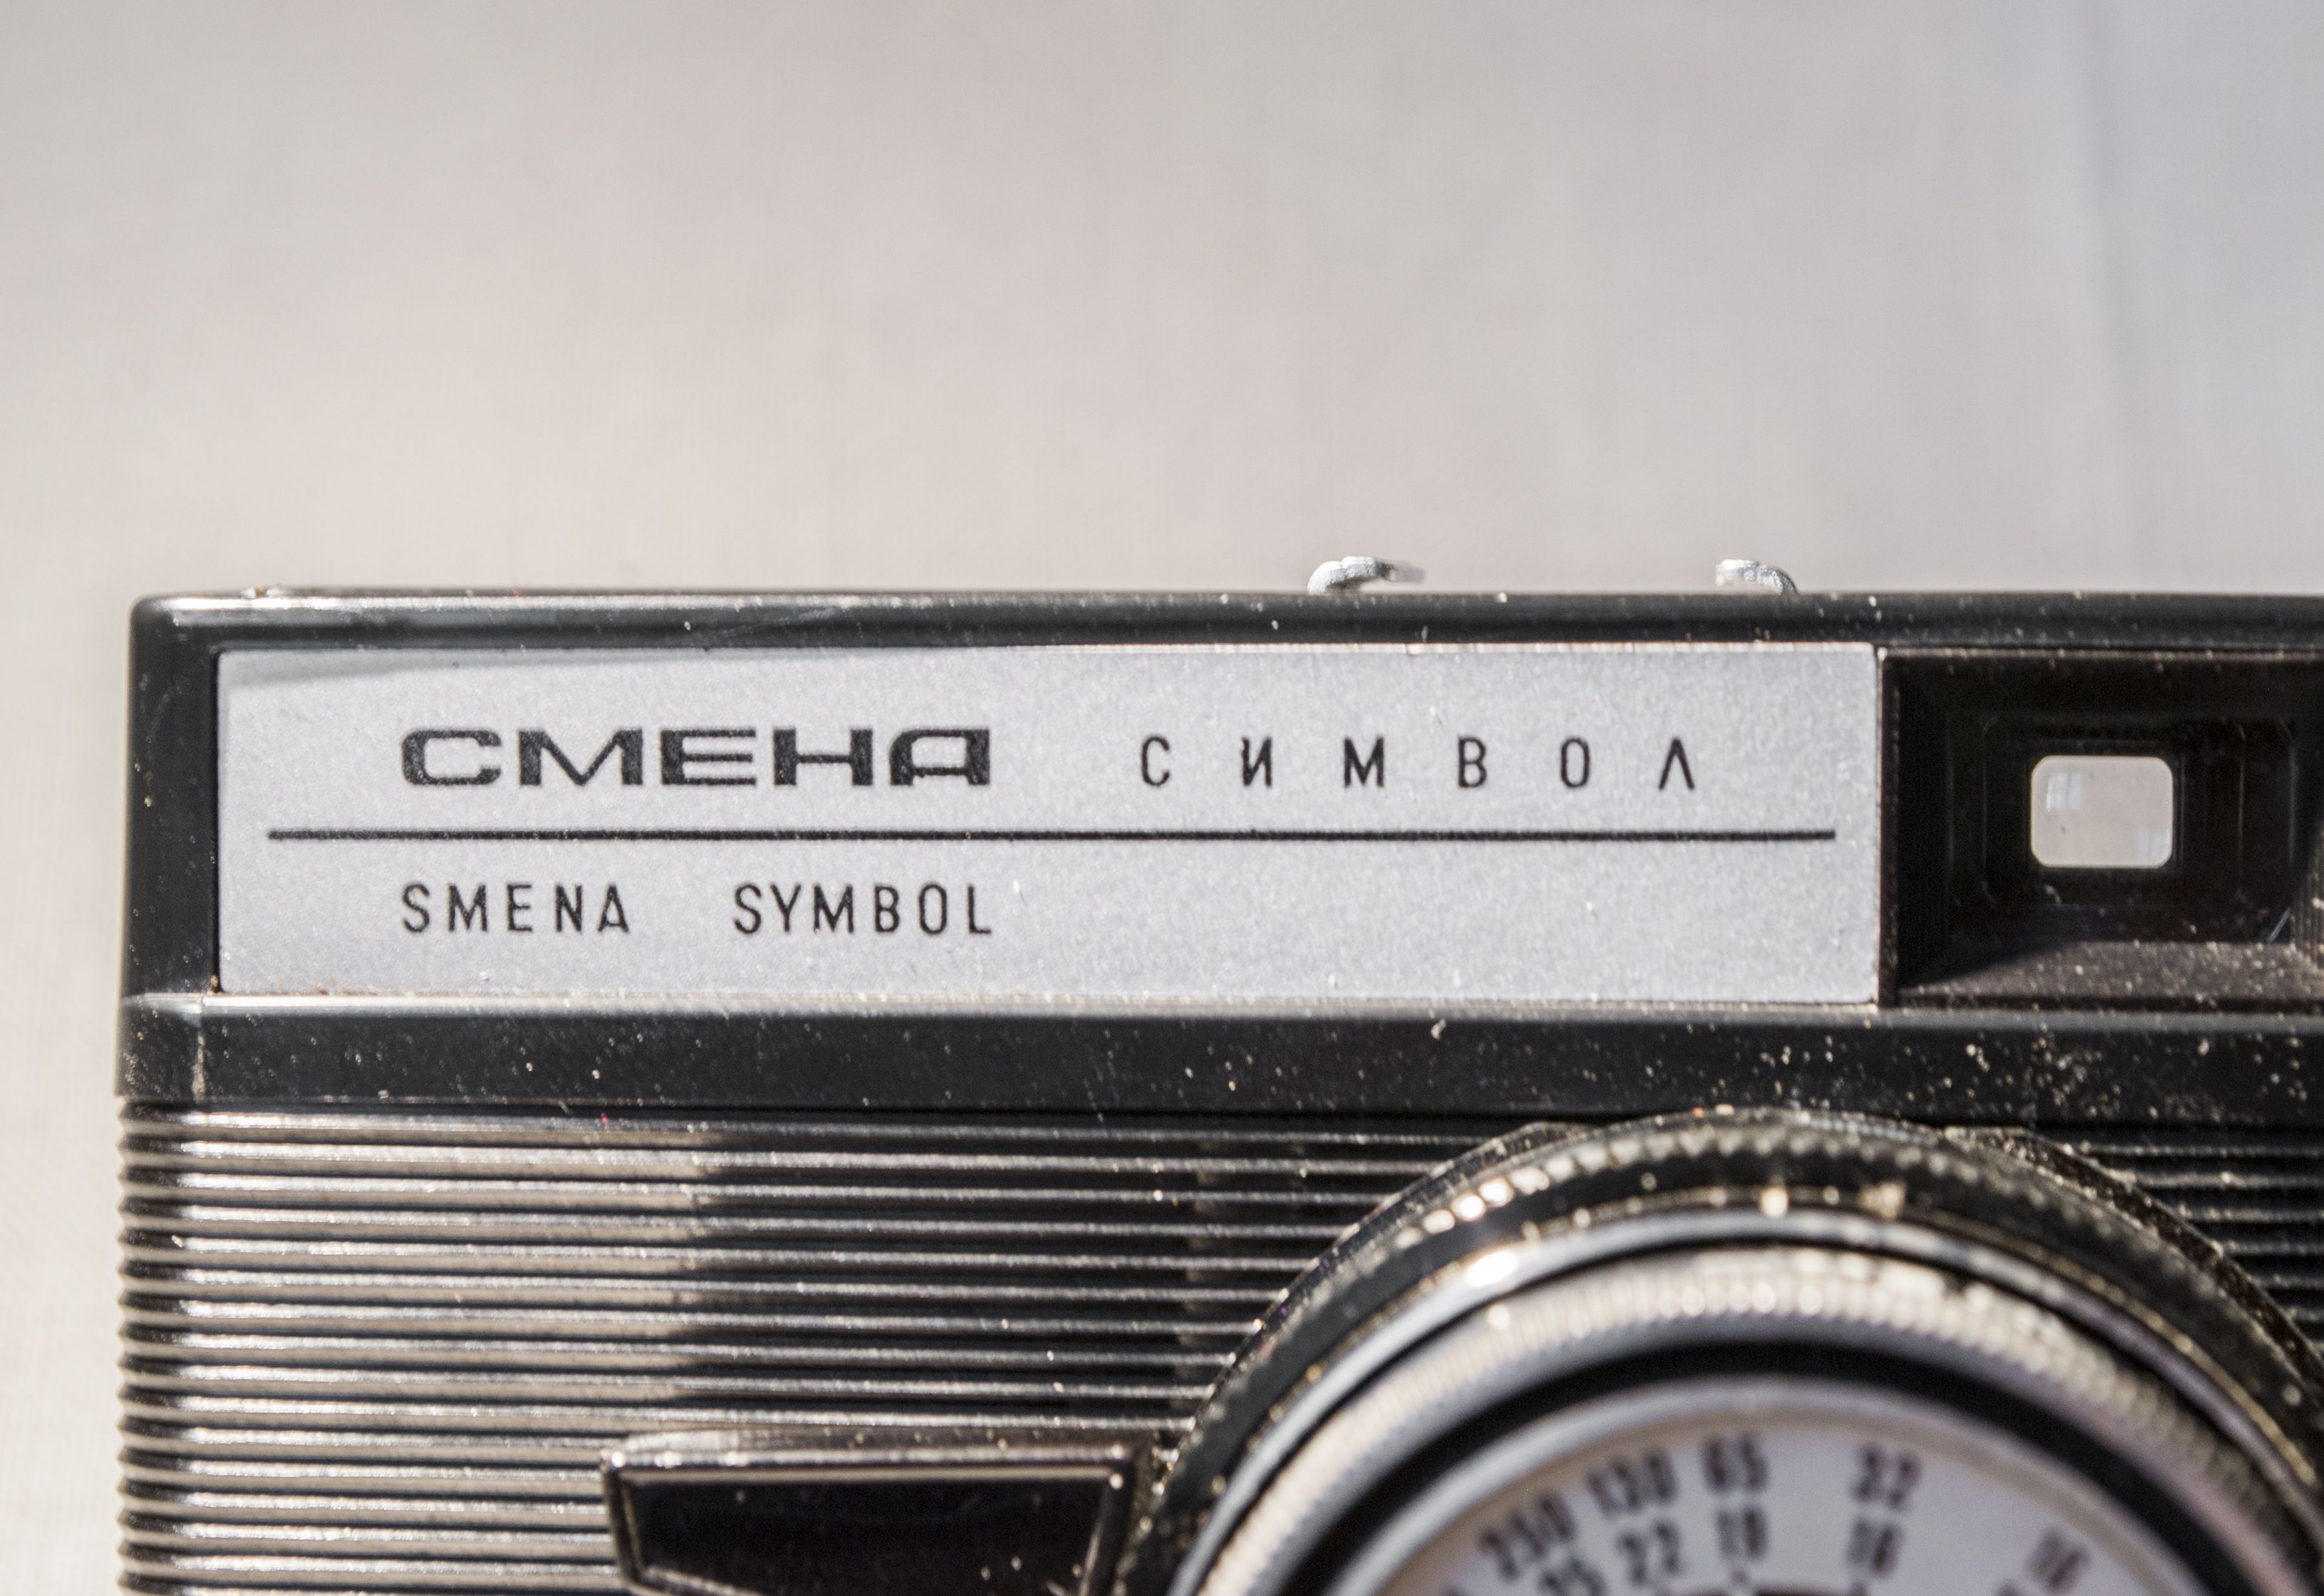 Смена Символ - Smena Symbol